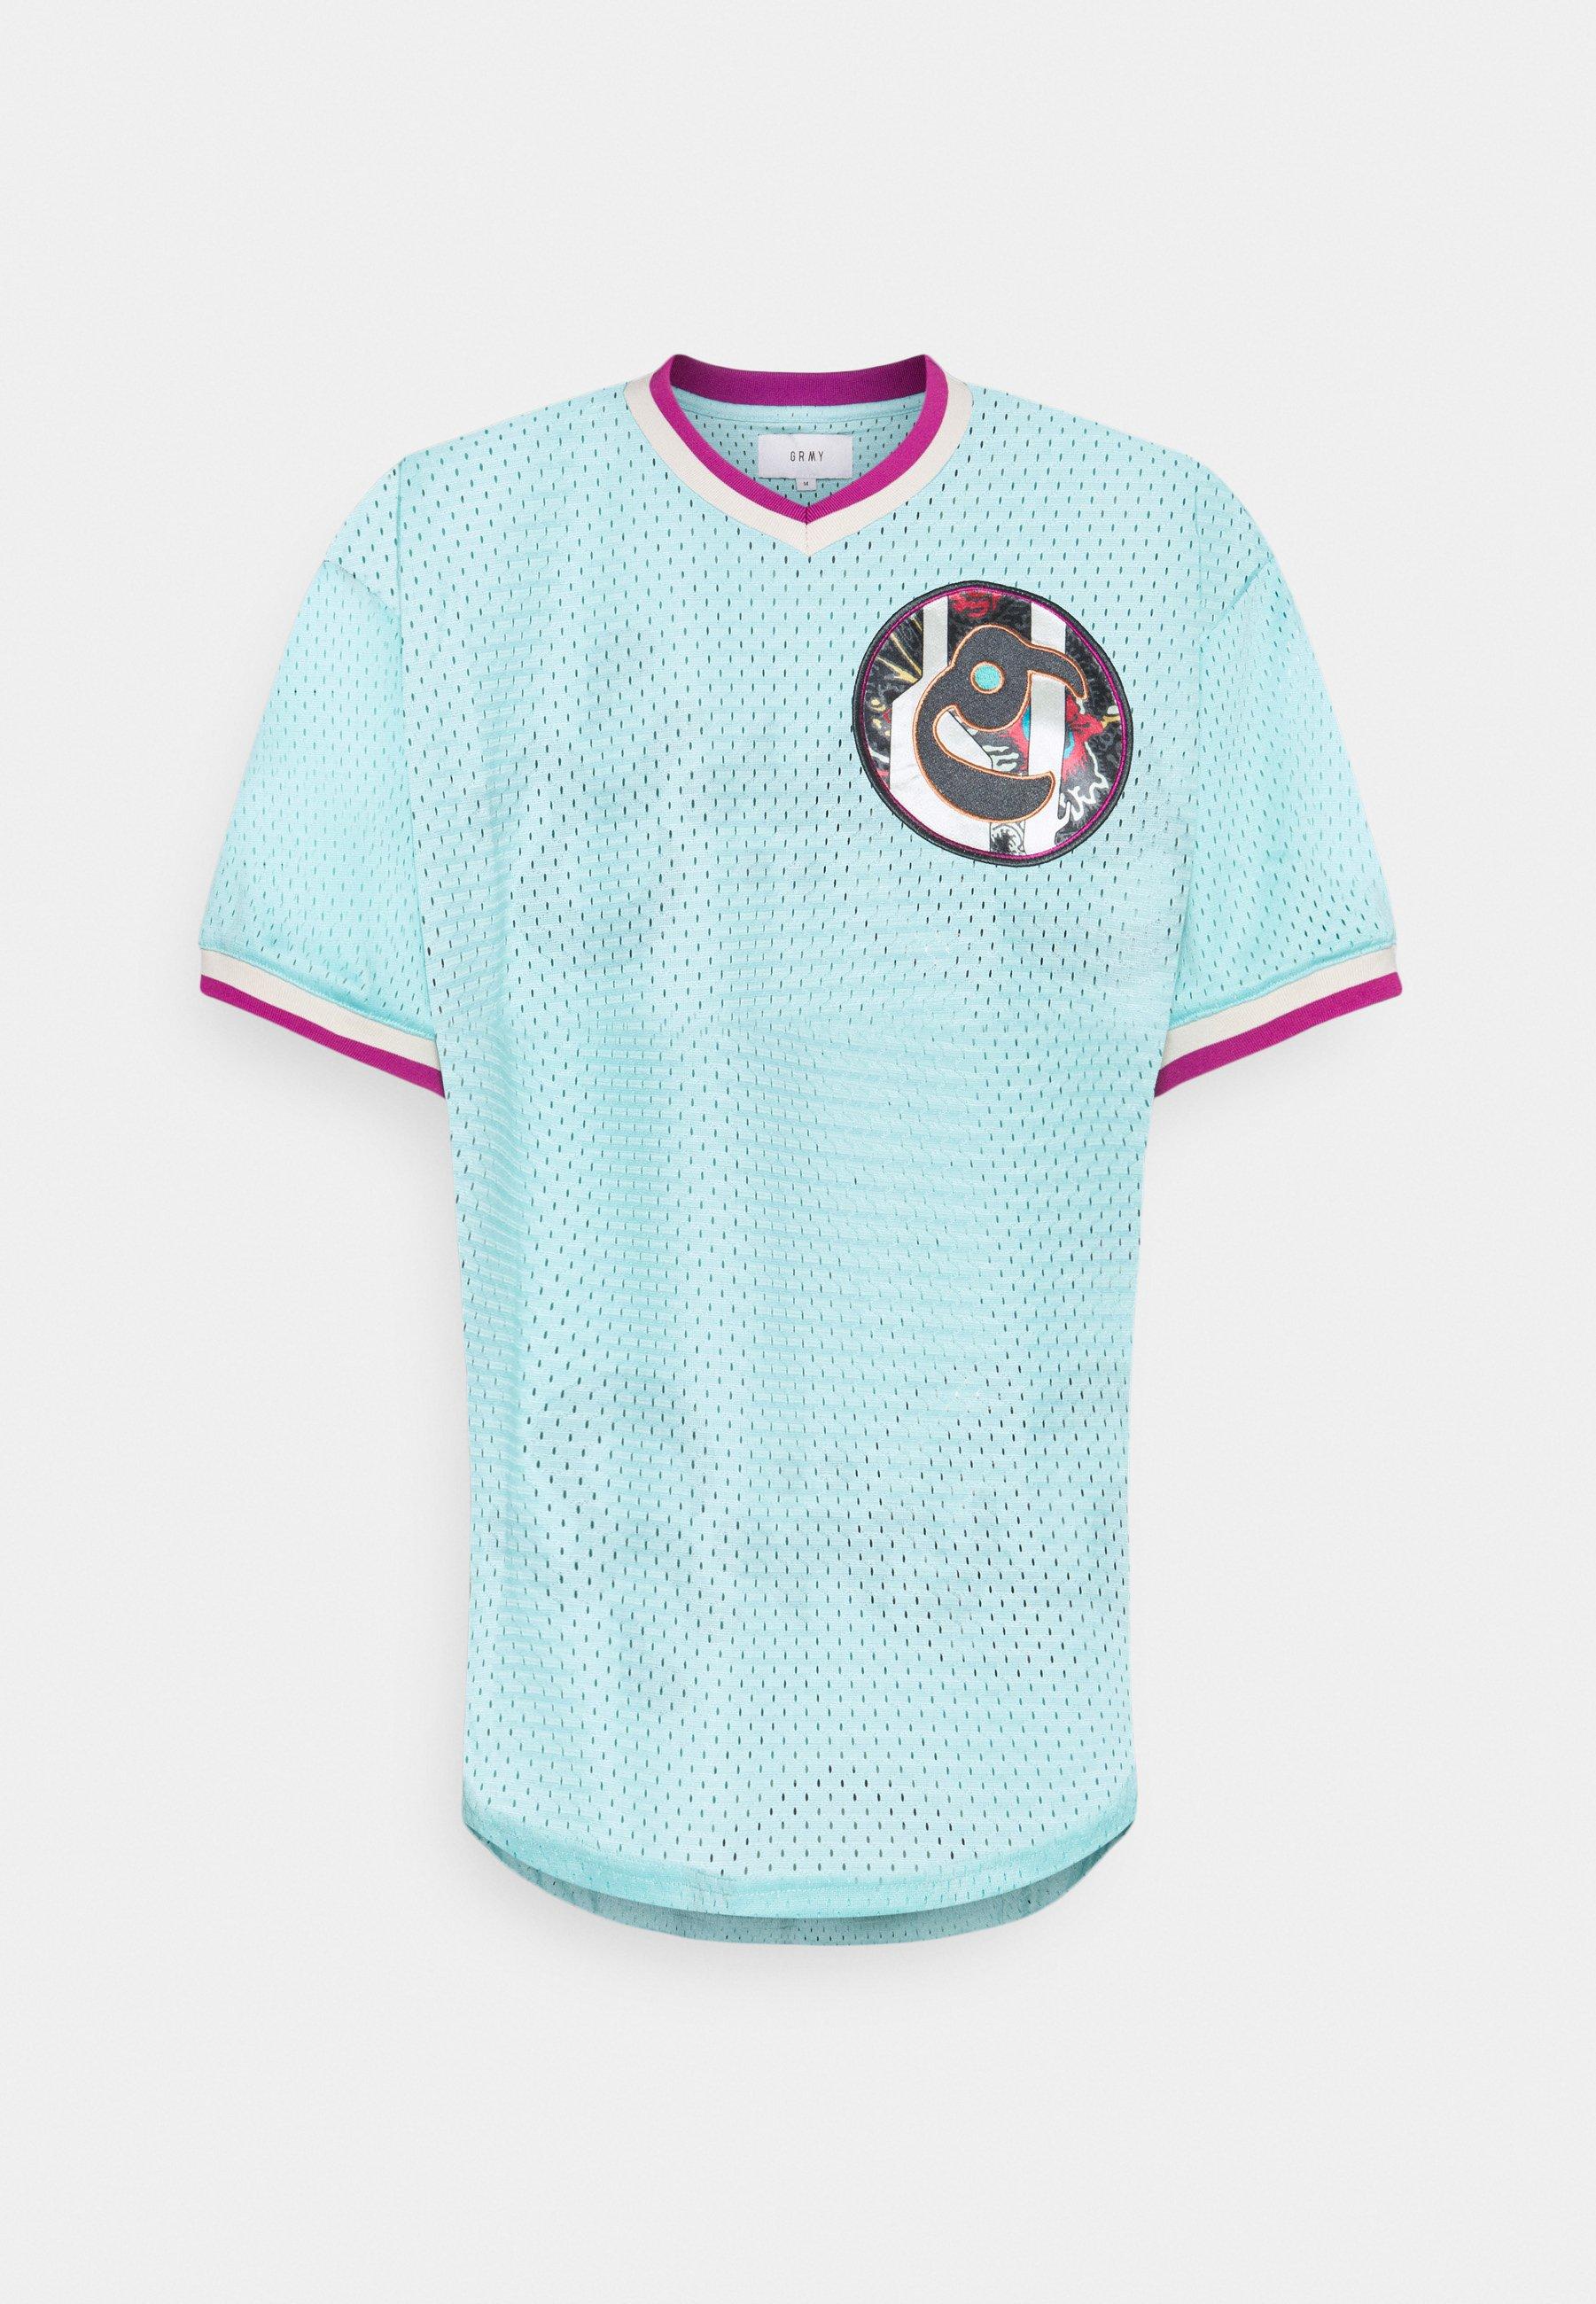 Men HOPE UNSEEN V NECK TEE UNISEX - Print T-shirt